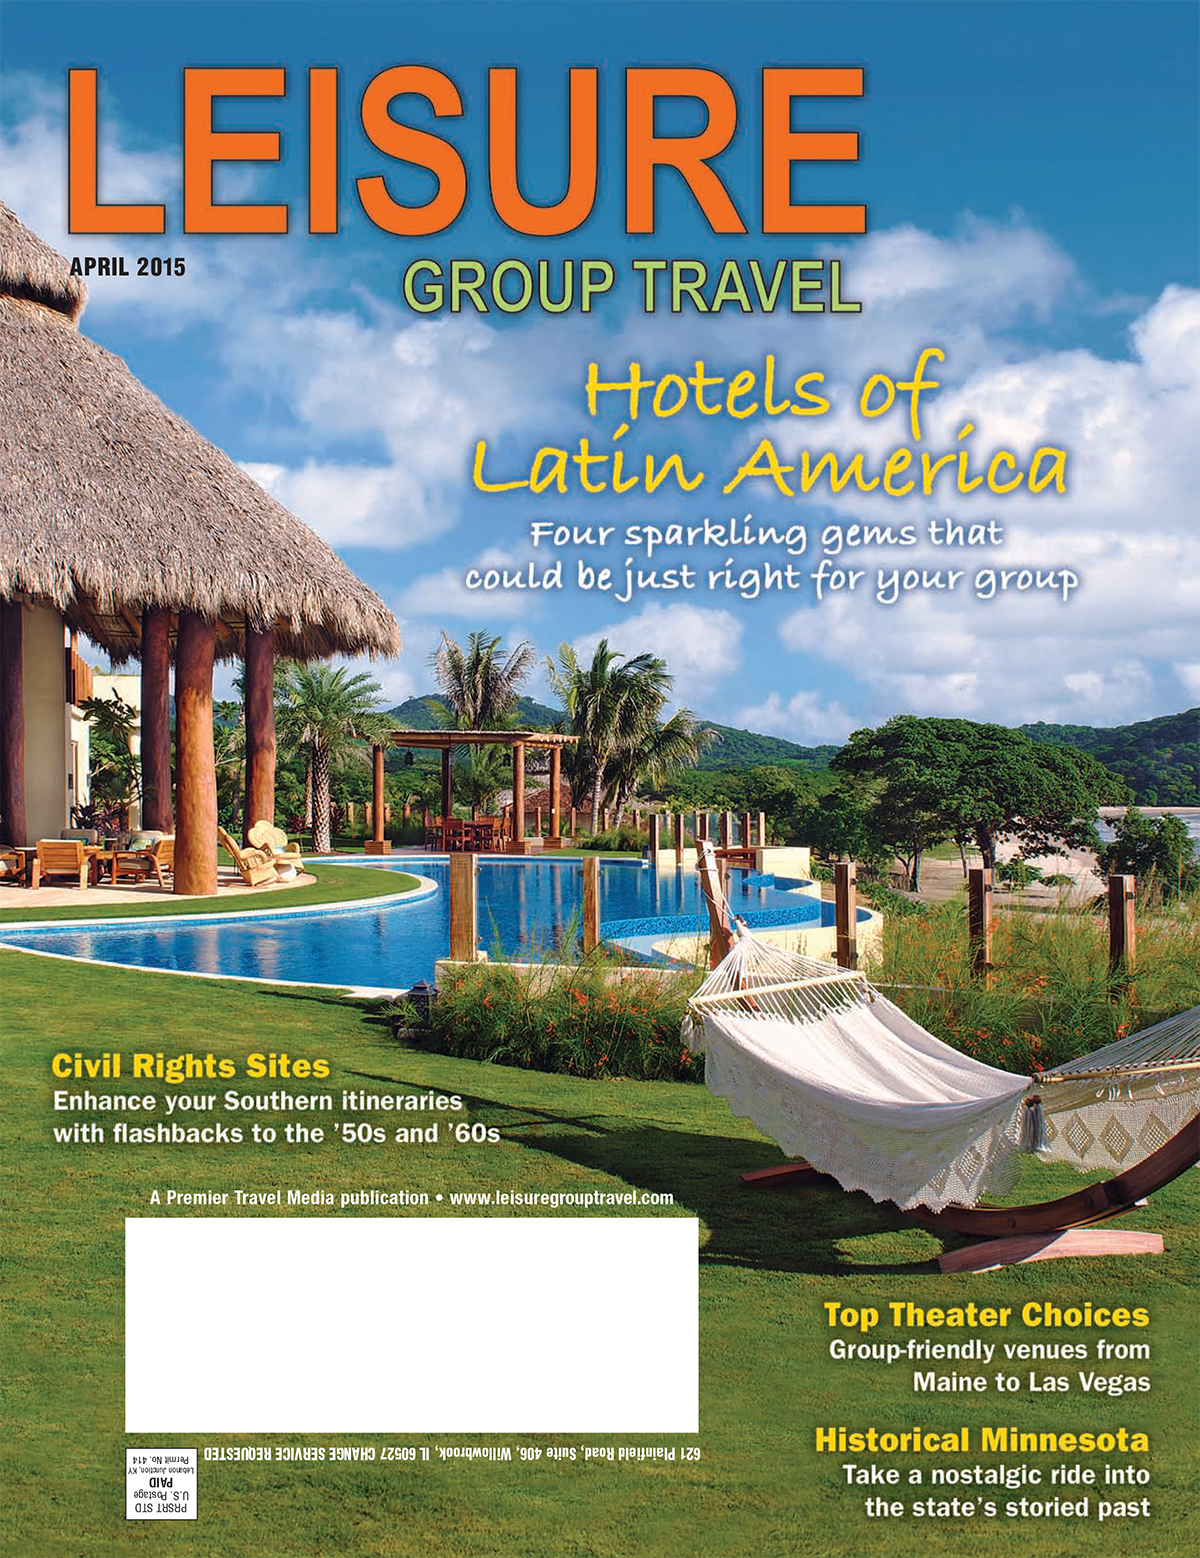 April 2015 Leisure Group Travel Magazine